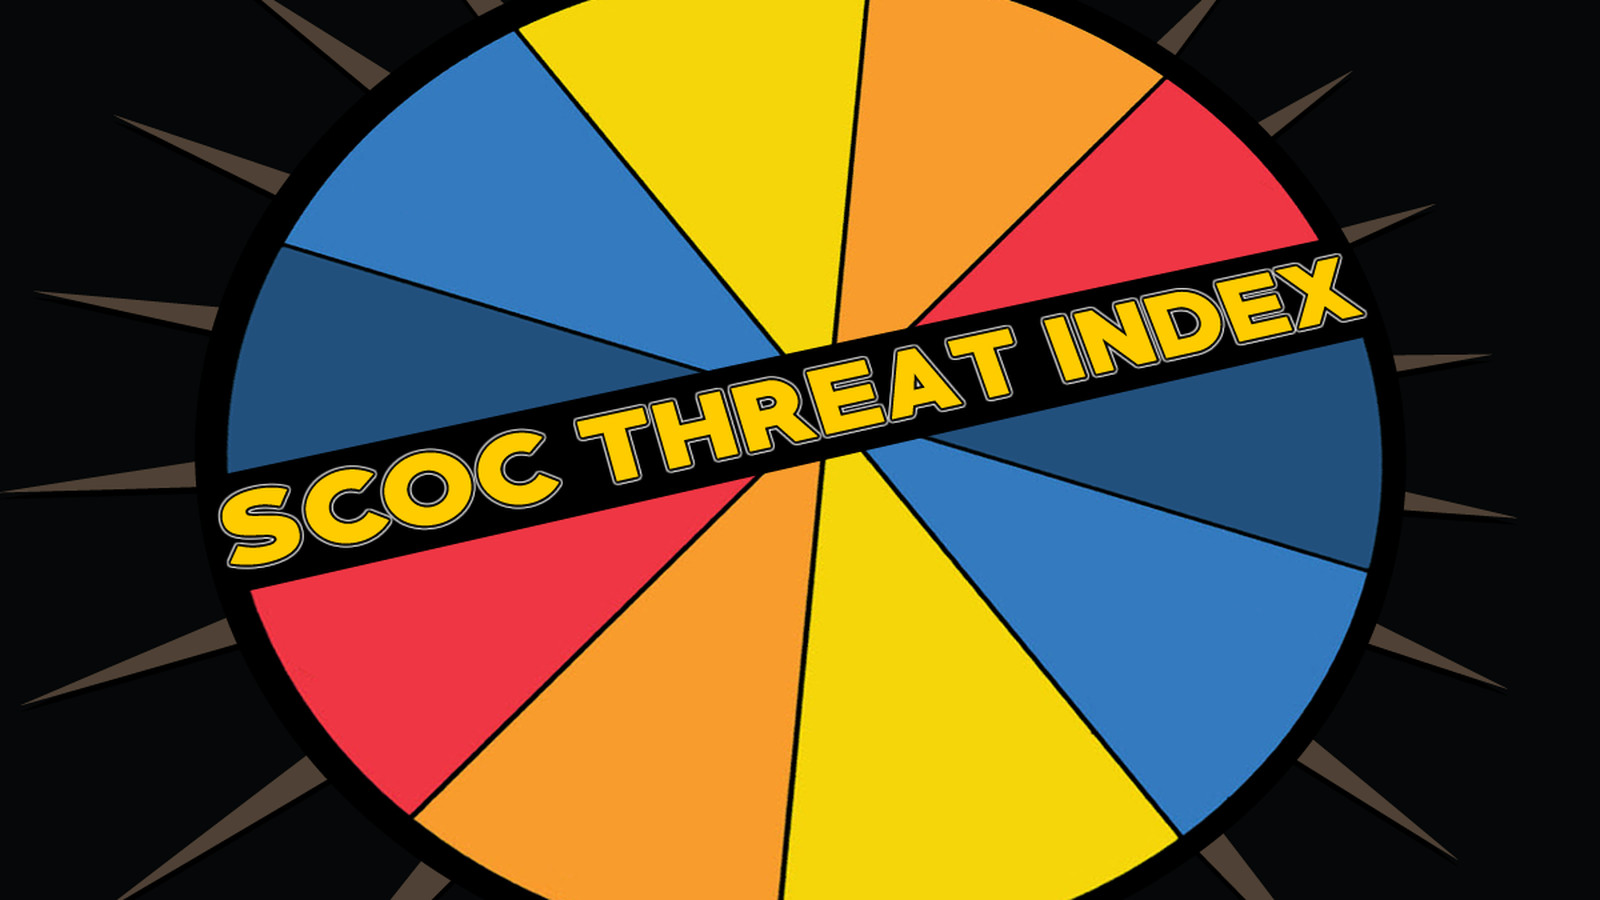 Threatindex.0.0